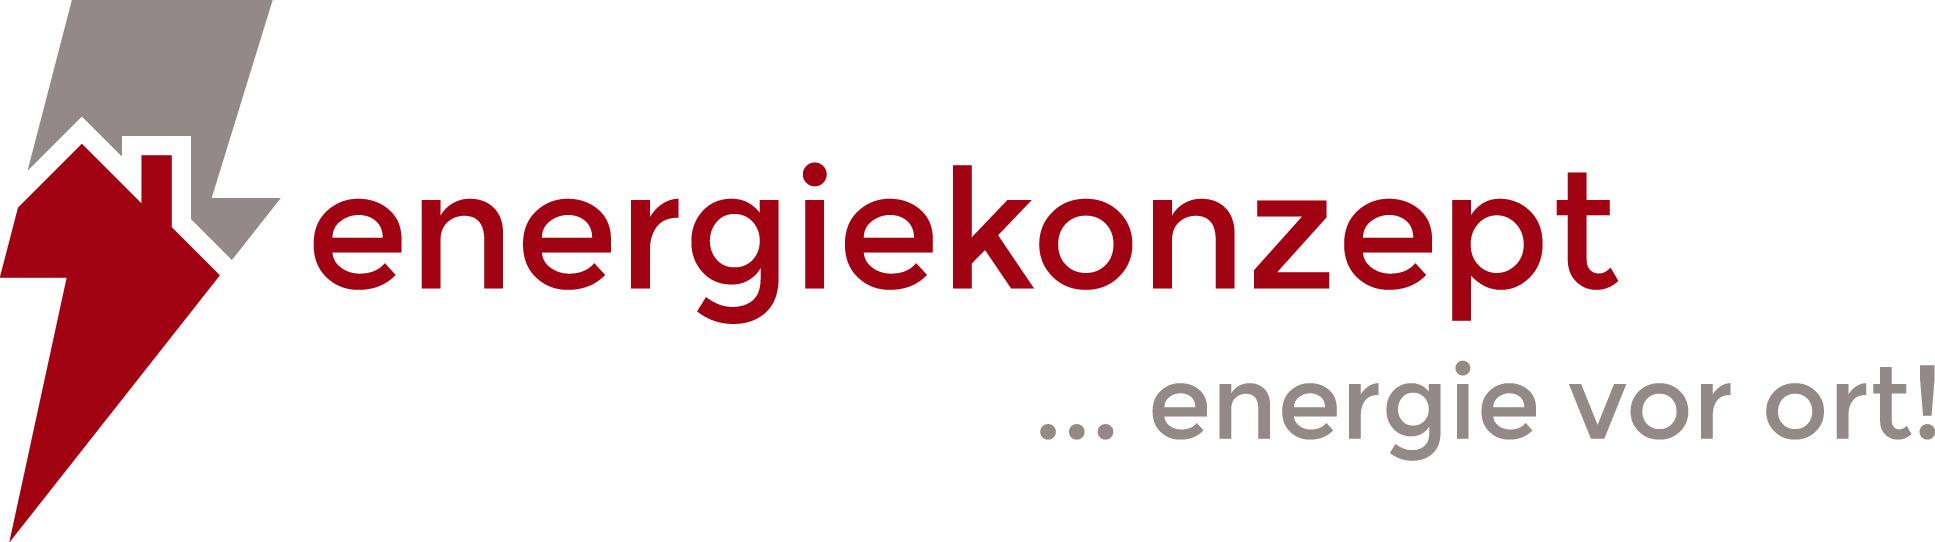 energiekonzept ortenau GmbH